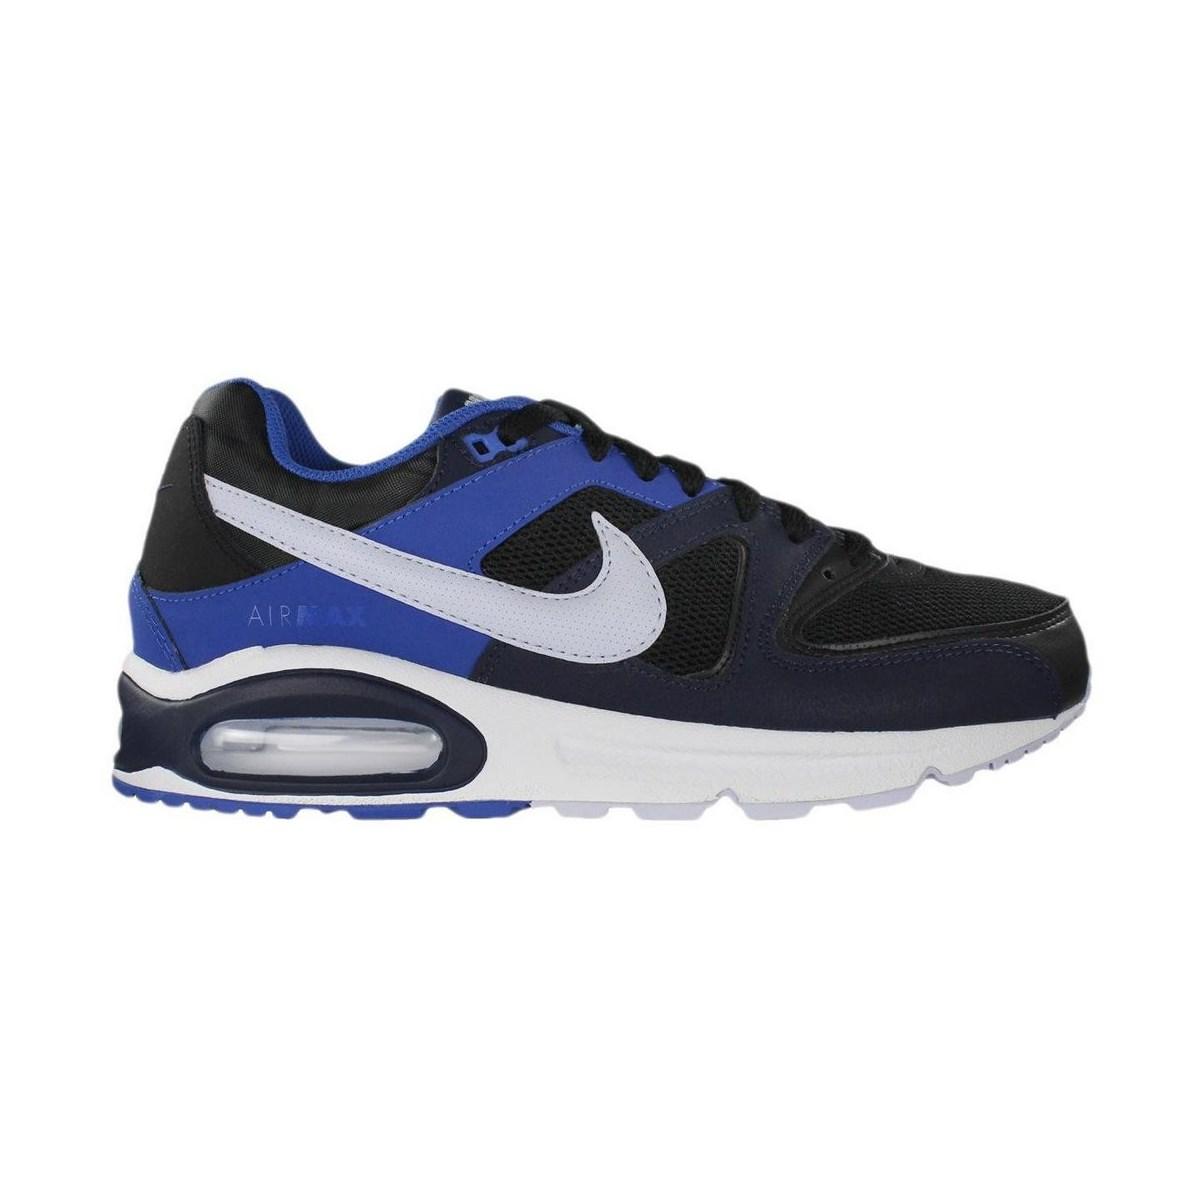 Air Max Command Erkek Mavi Ayakkabı